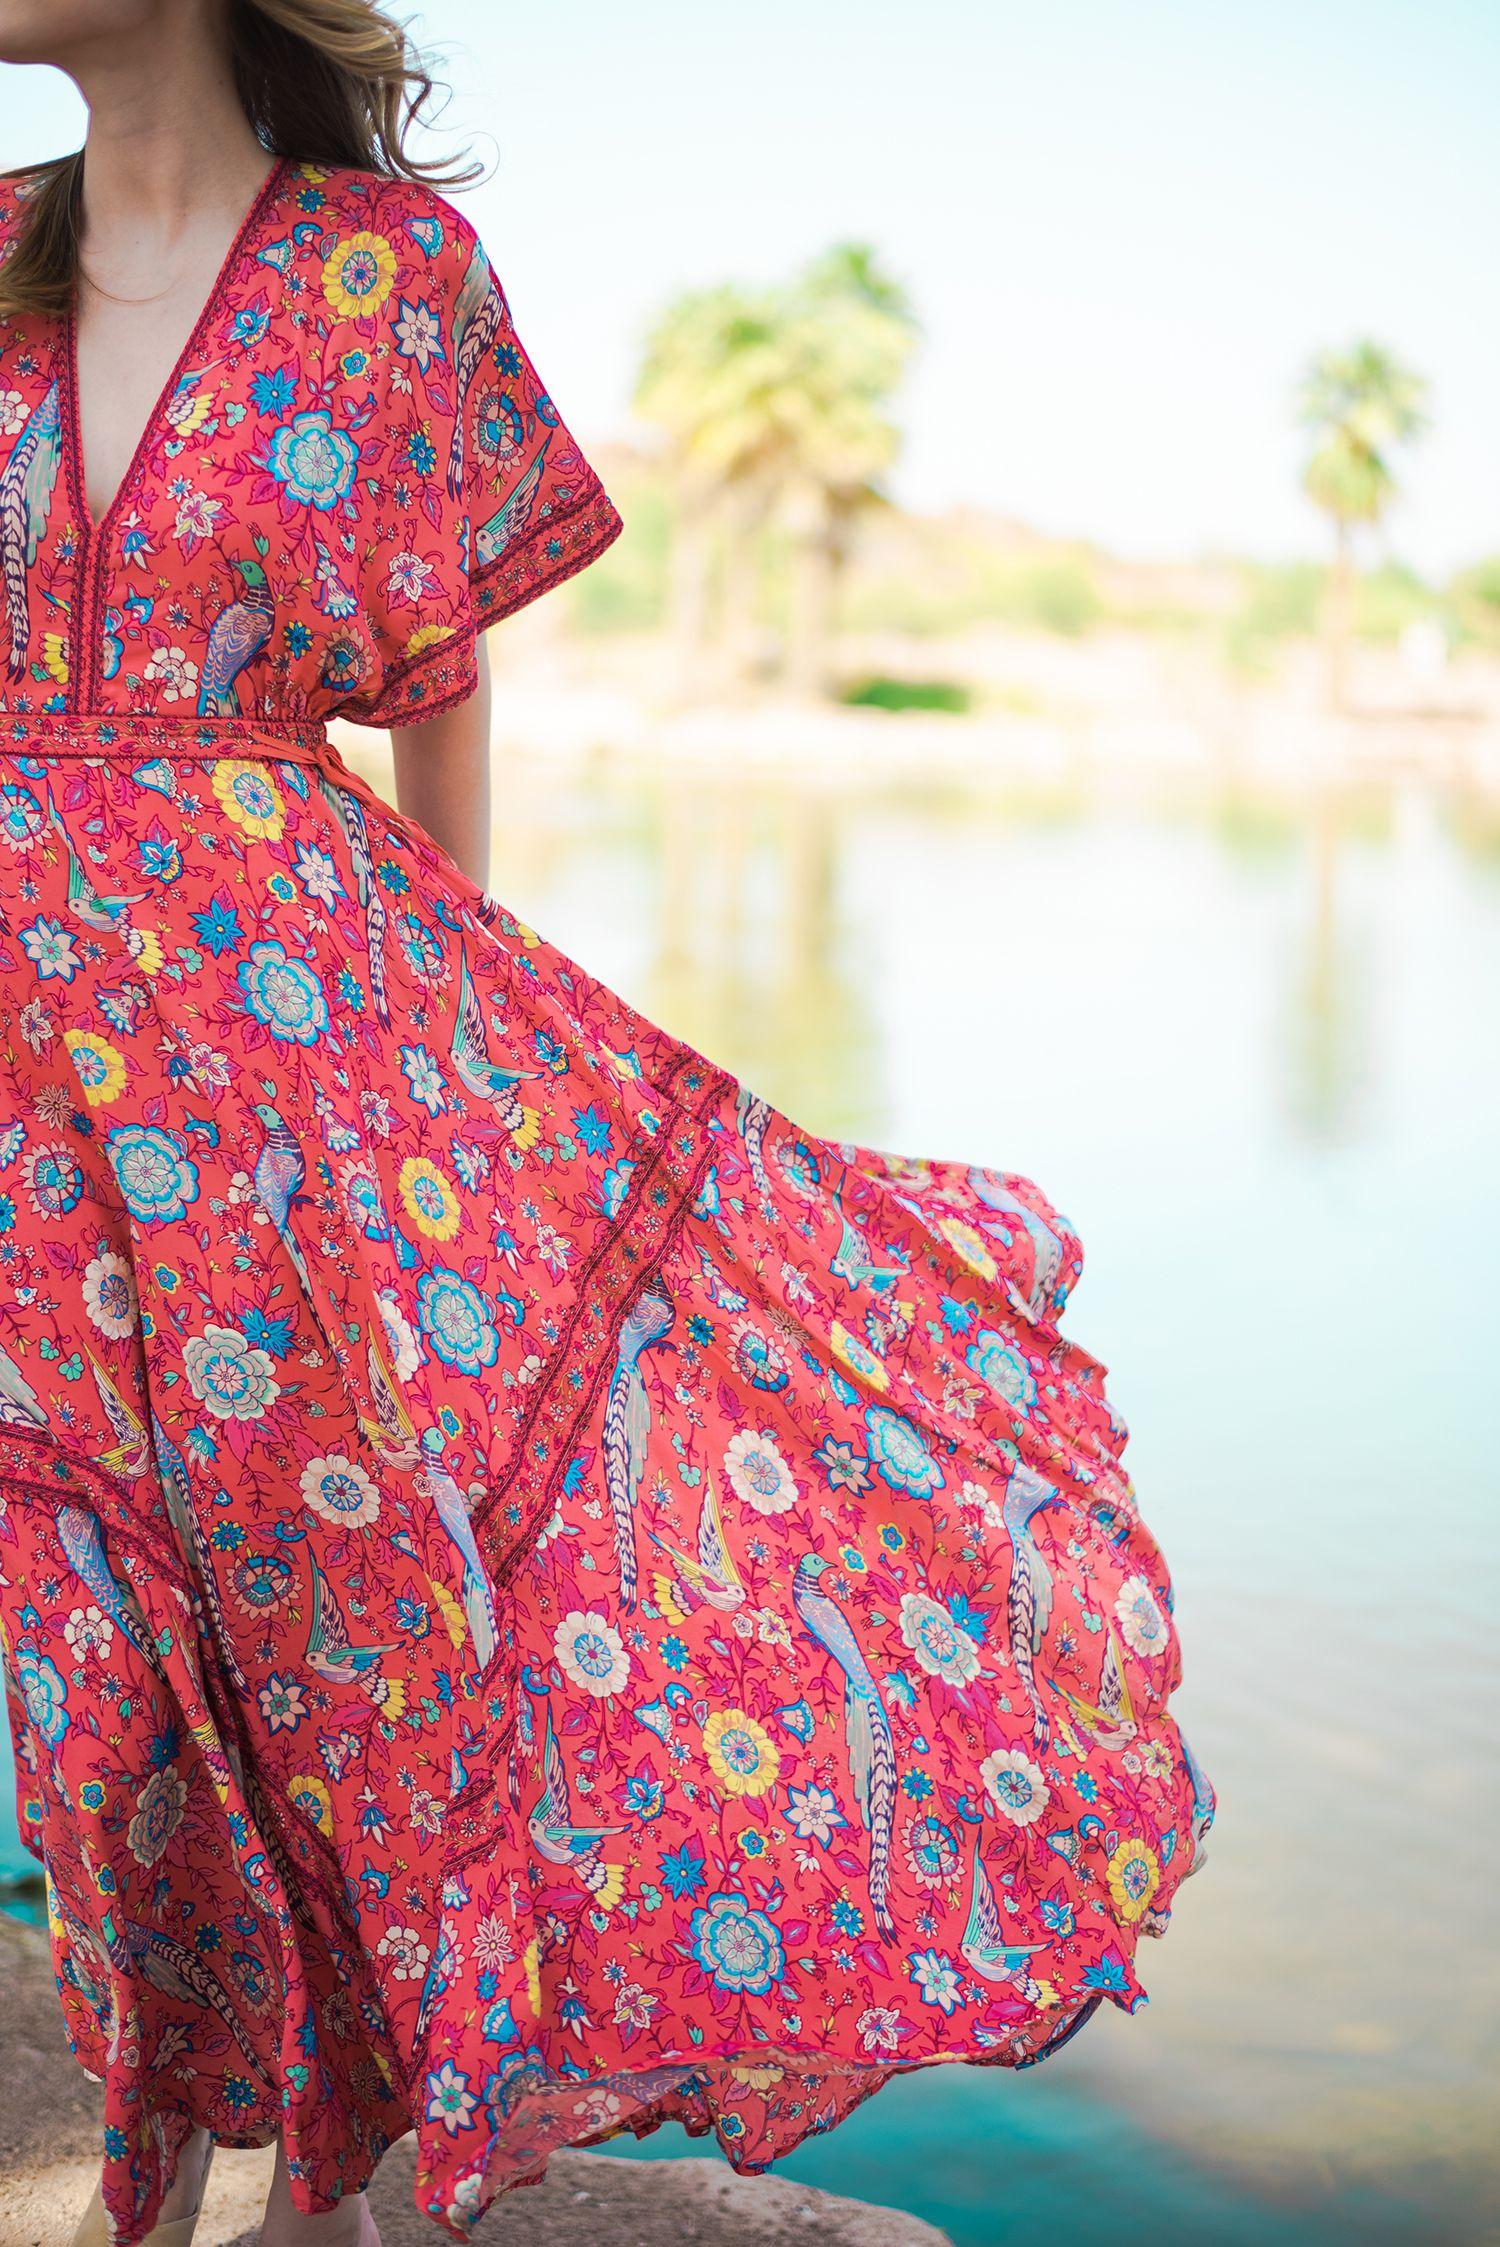 bff02582d27 Spell   Byron Bay dress - Scottsdale - The A List